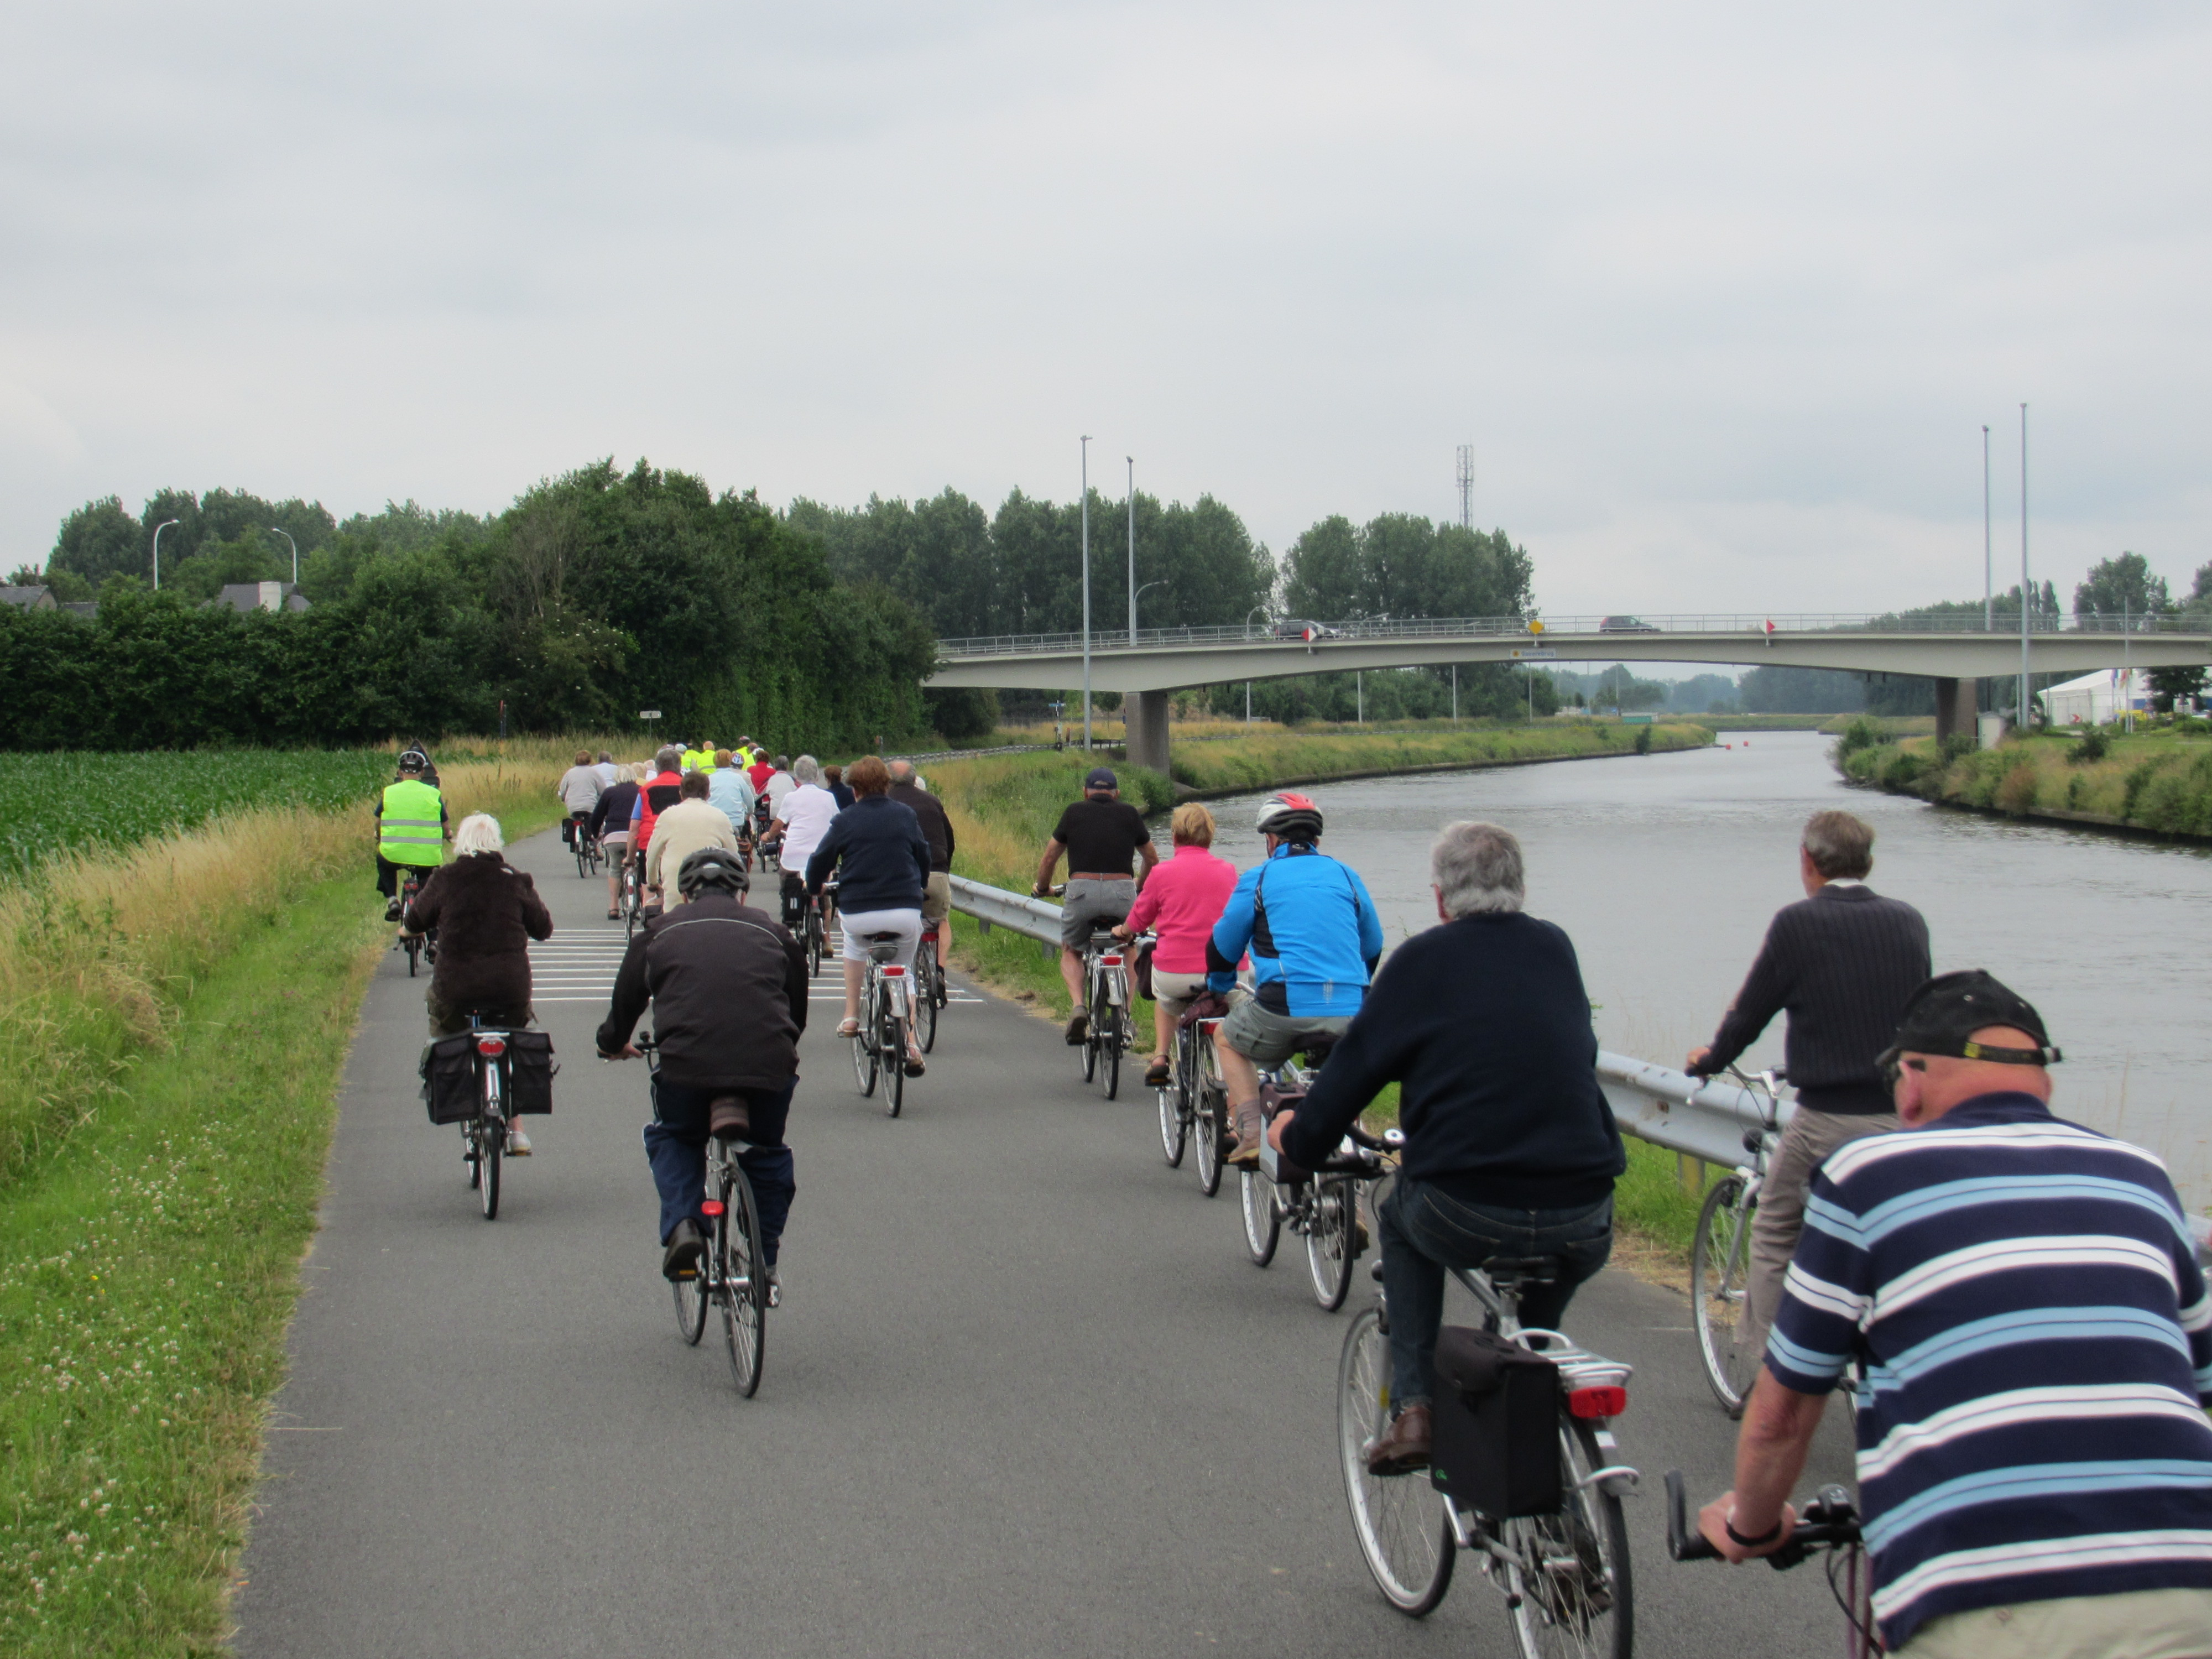 give us a break! Even the senior citizens ride didn't bat an eyelid